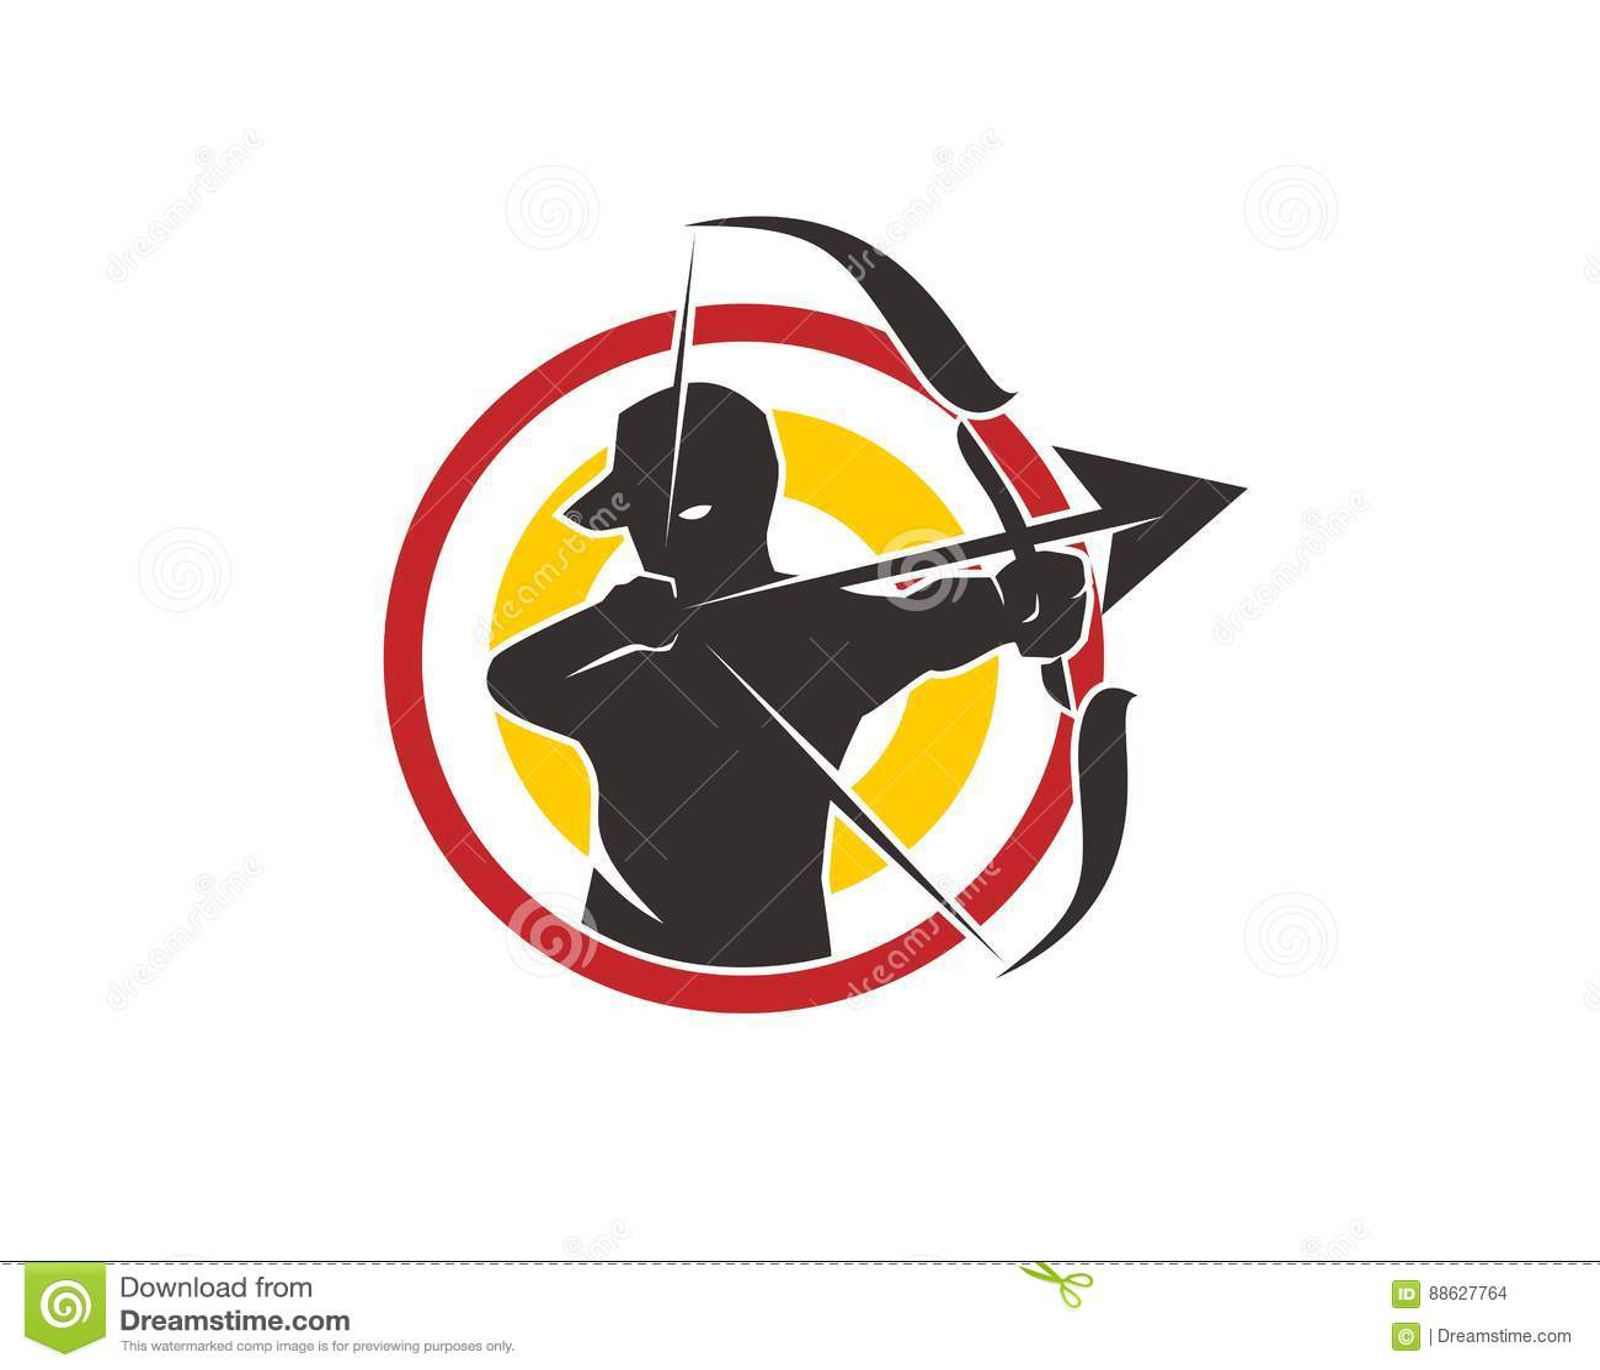 Archery logo stock vector  Illustration of archery, arrow